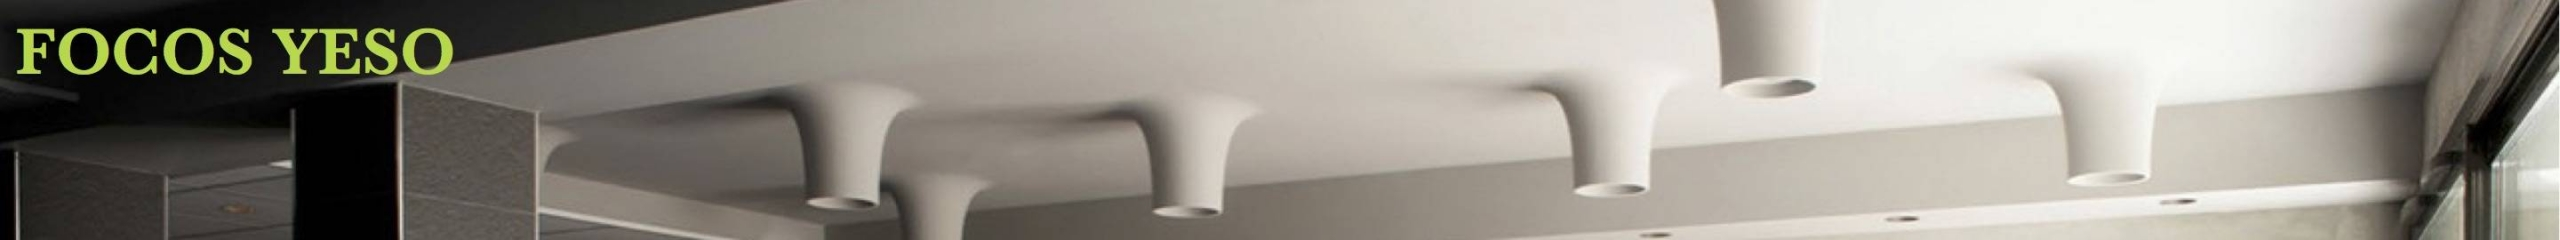 Focos Yeso LED